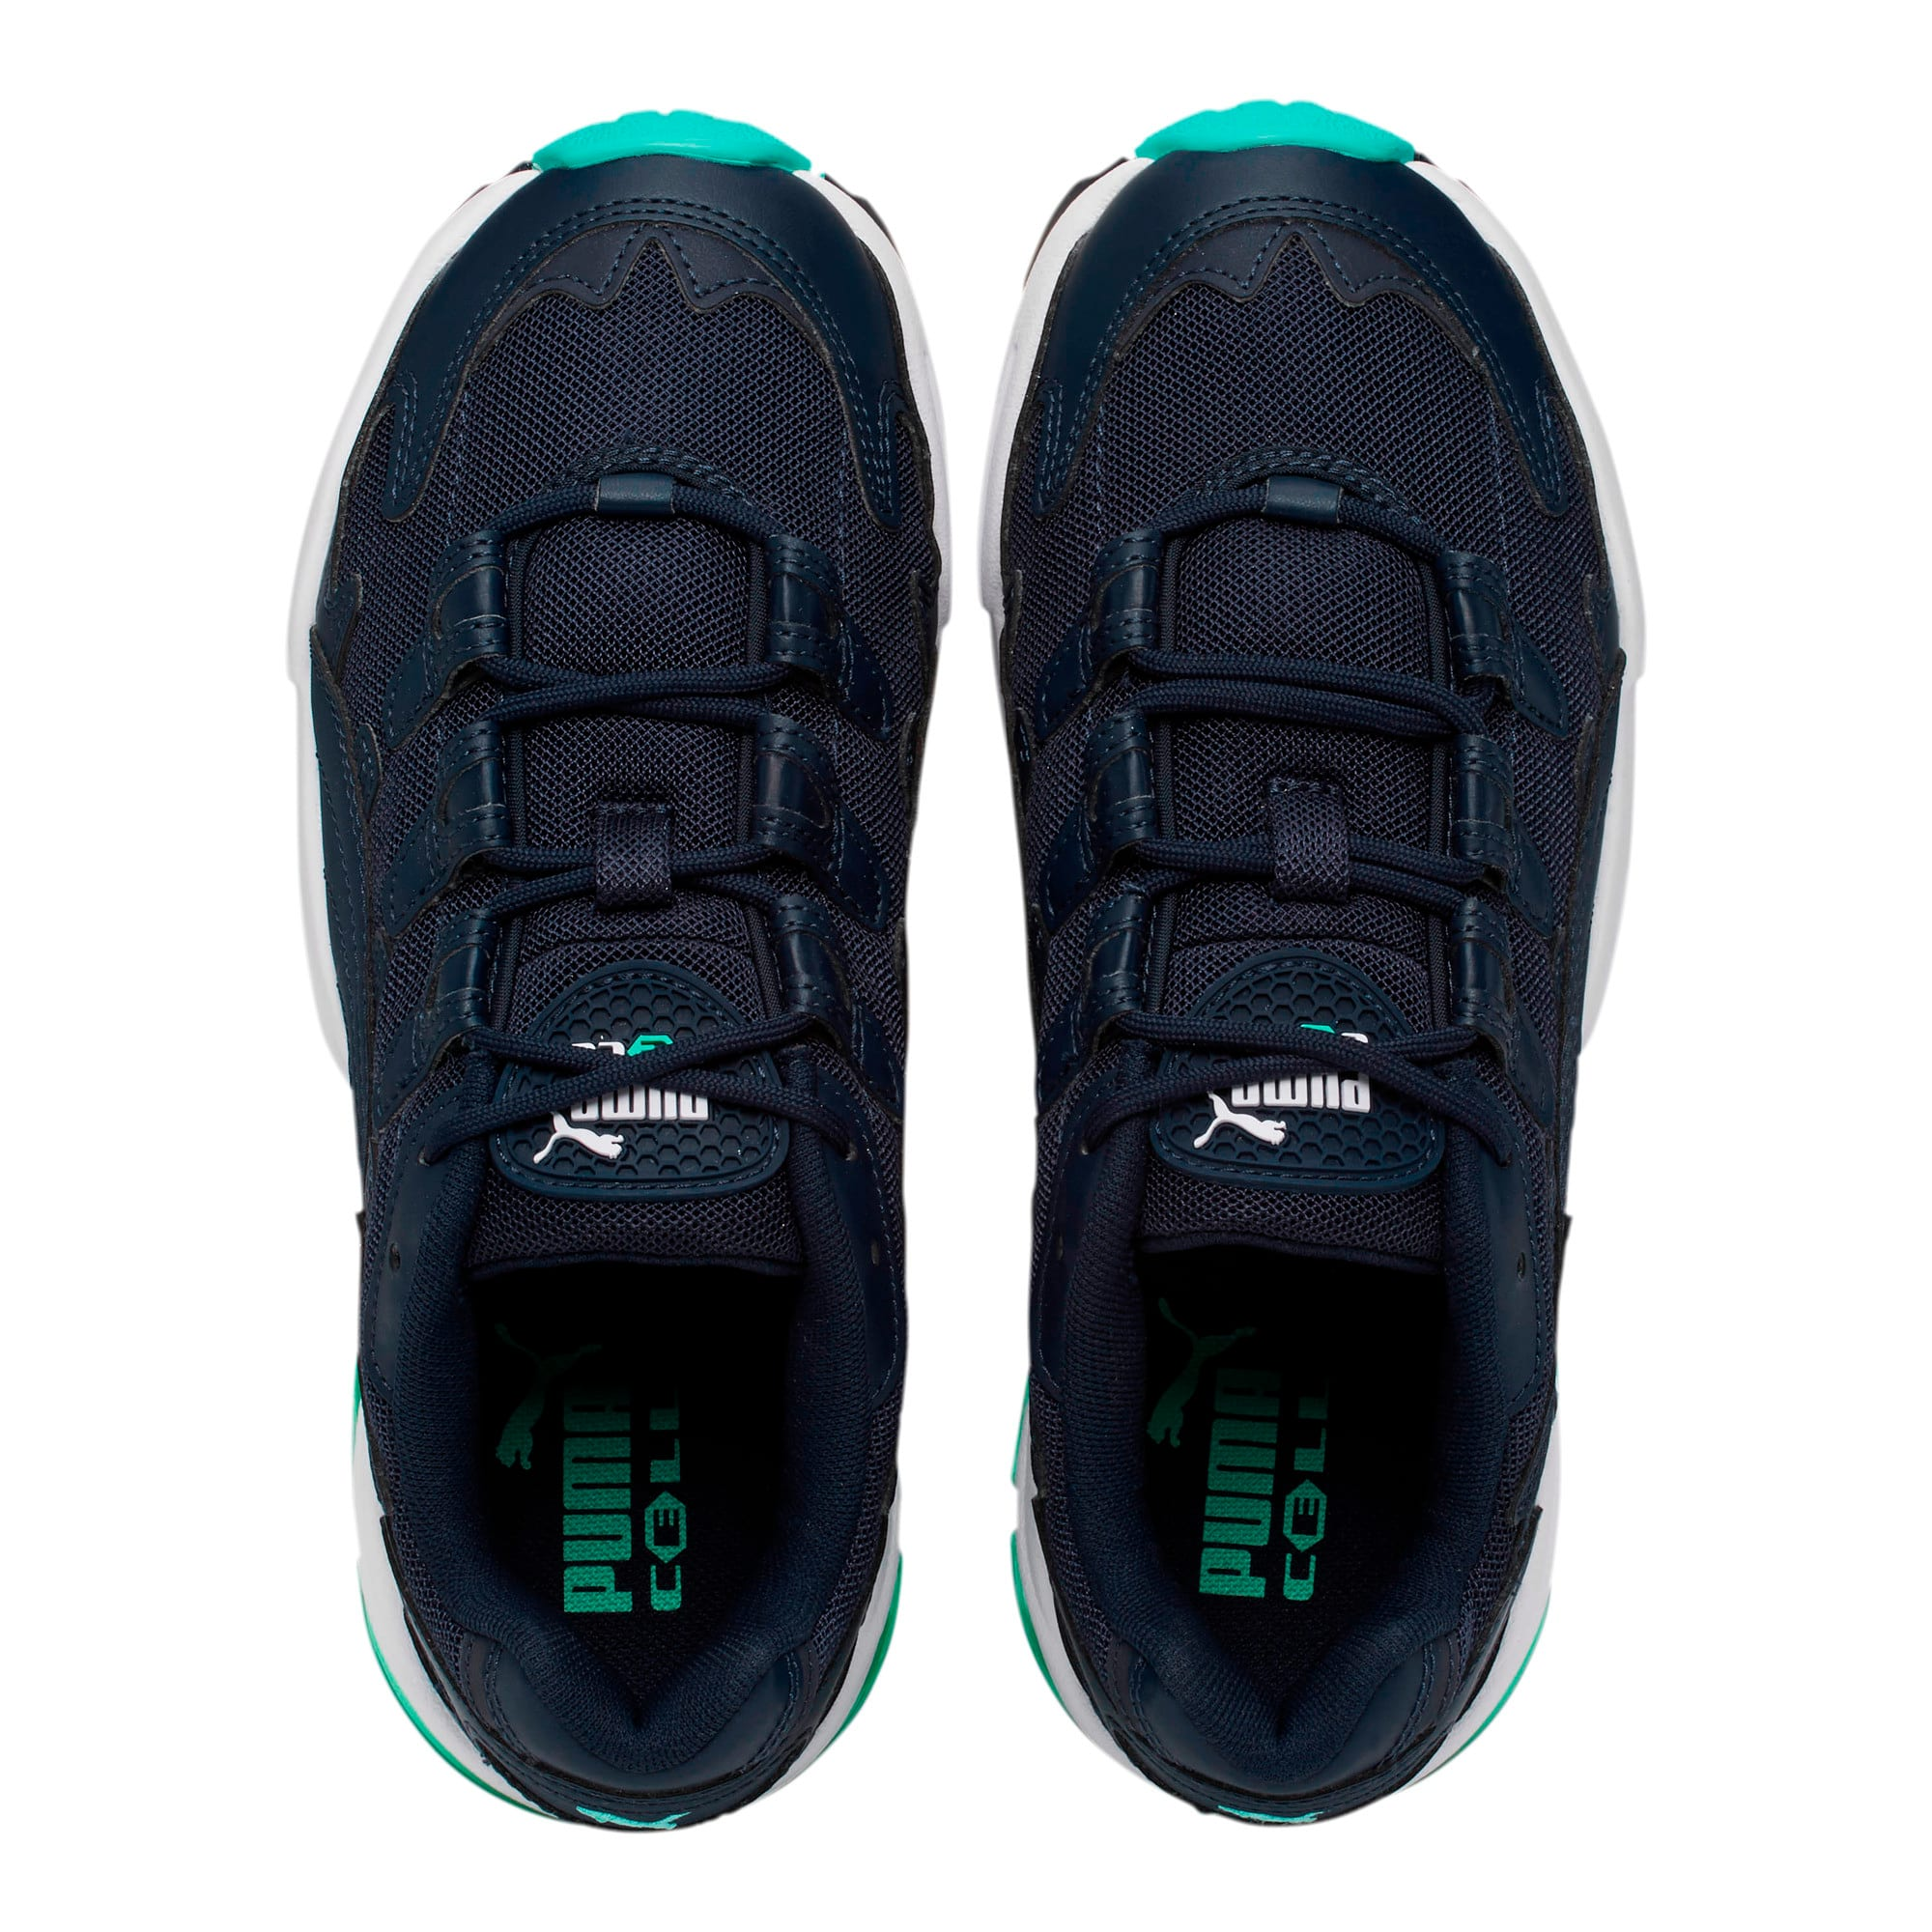 Thumbnail 6 of CELL Alien 51 Sneakers JR, Peacoat-Biscay Green, medium